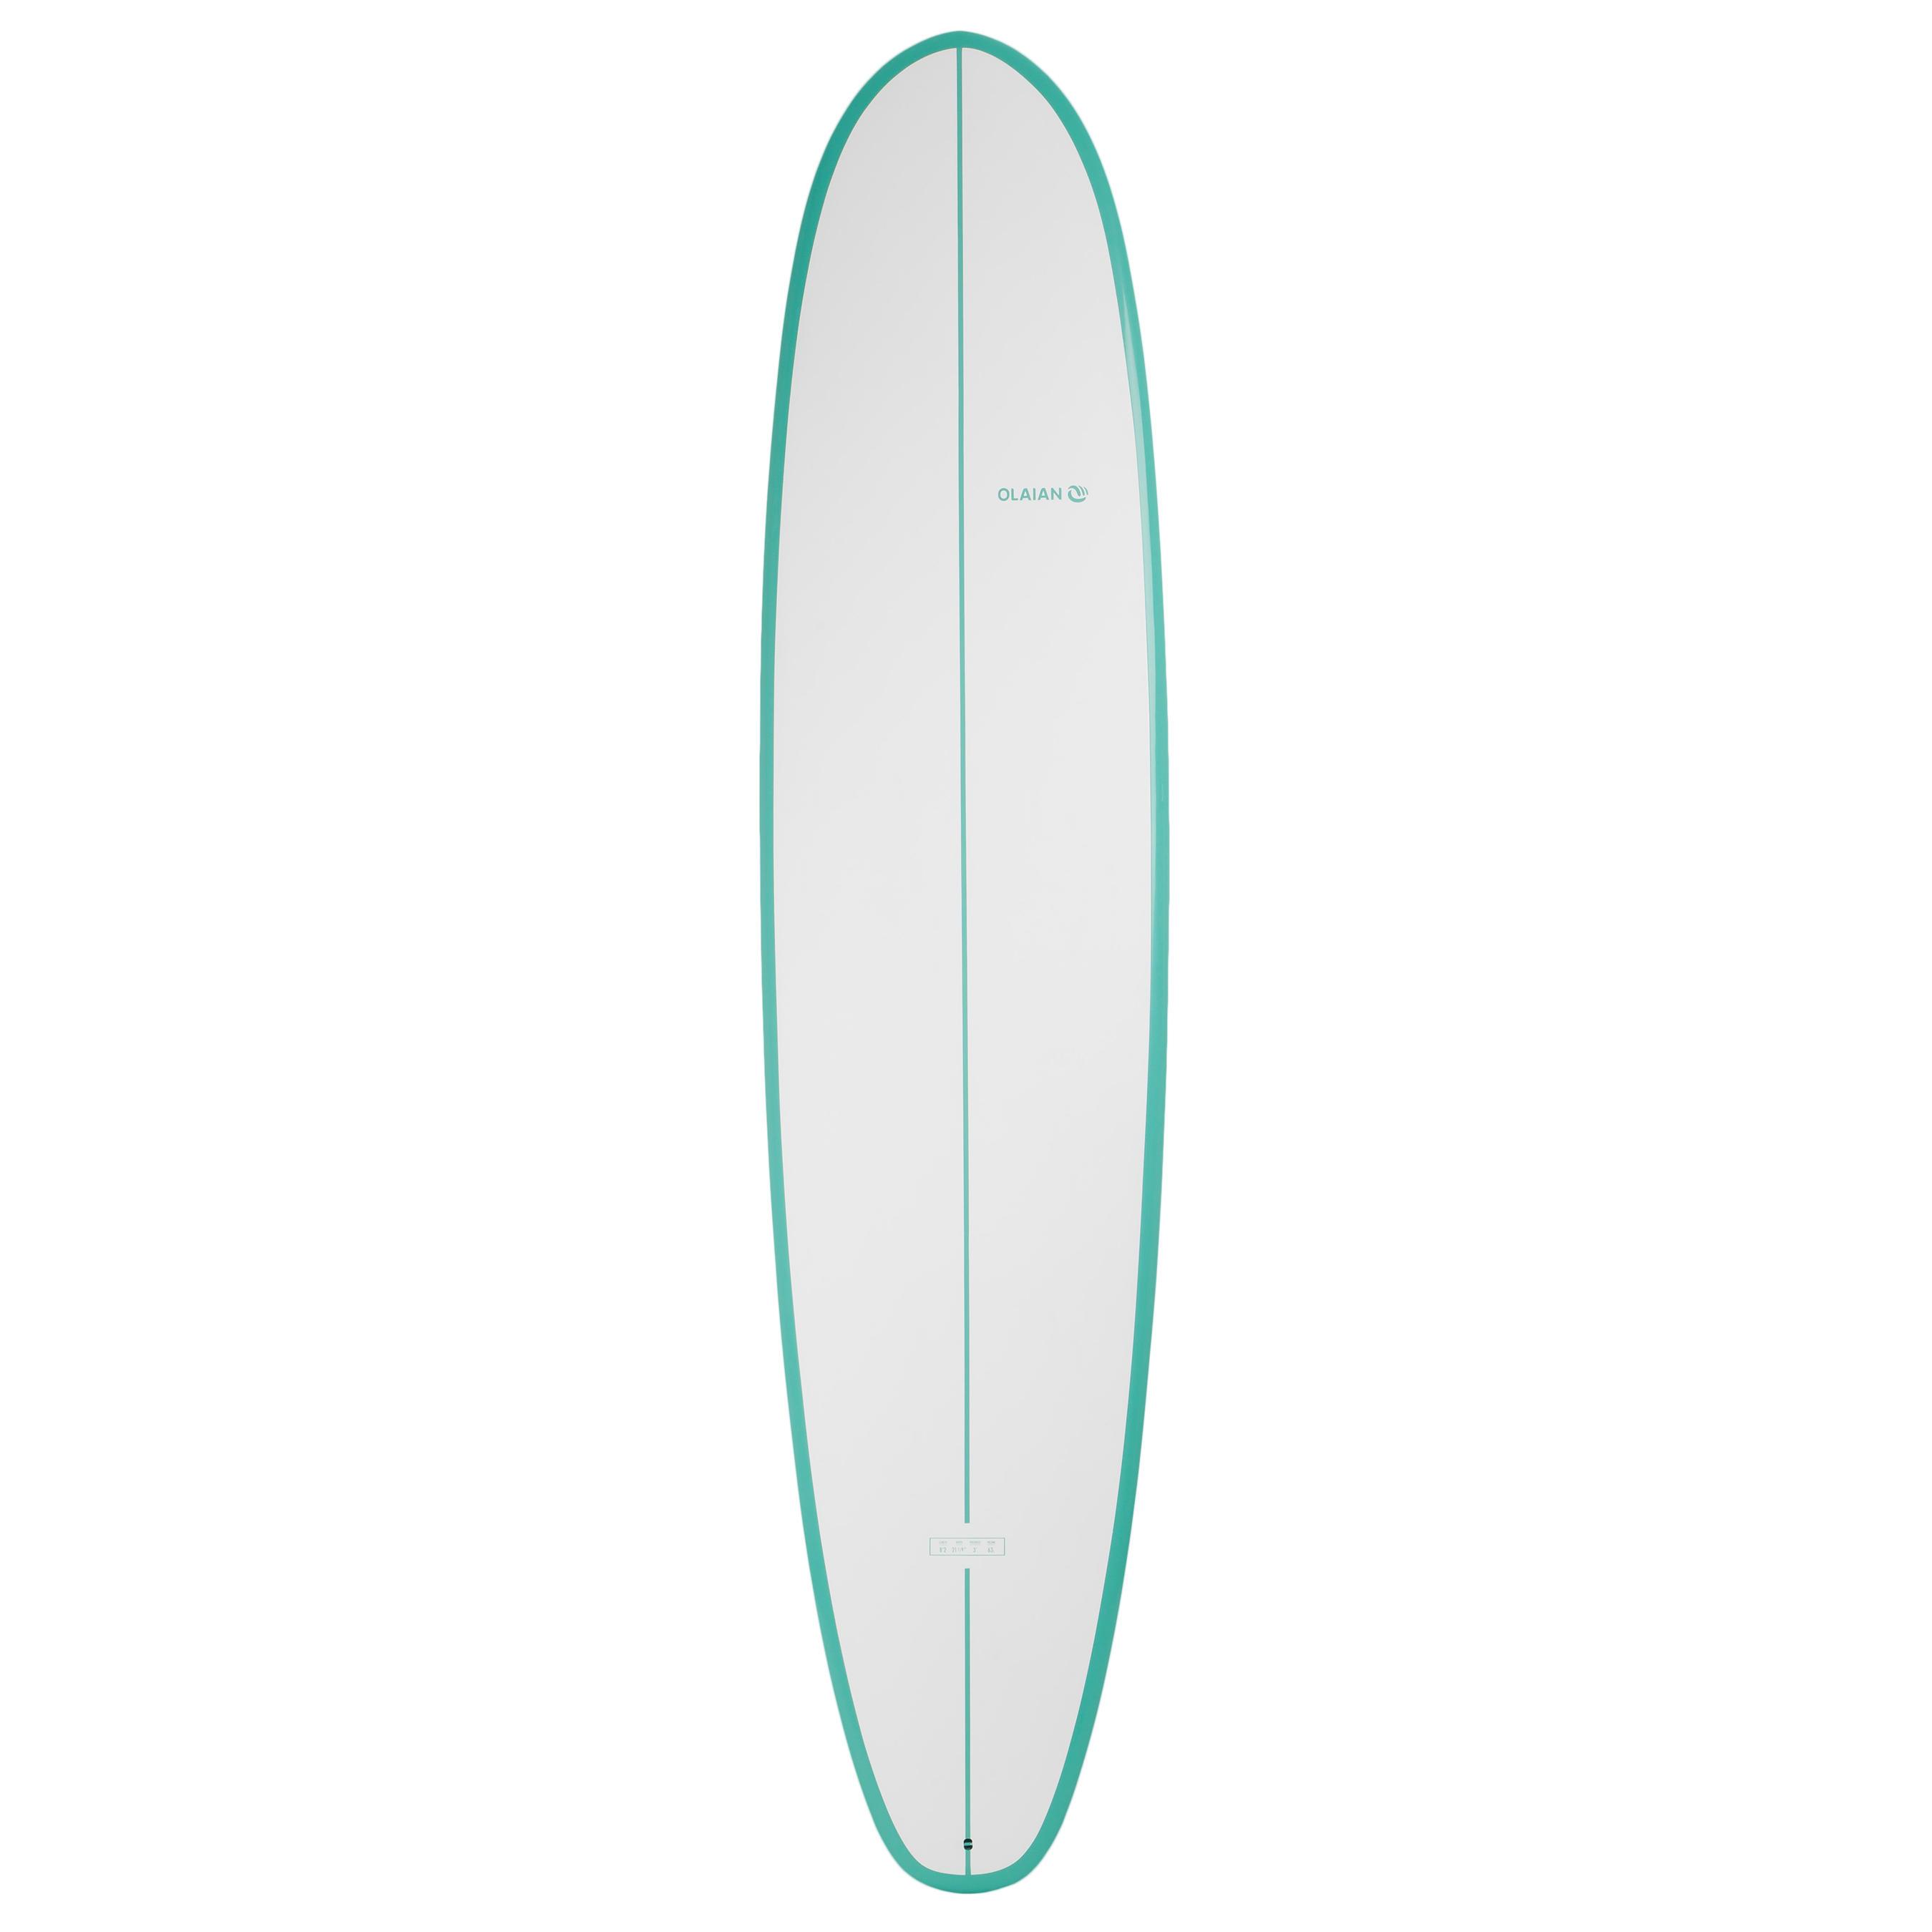 olaian planche de surf 500 8 39 2 mini malibu sandwich epoxy. Black Bedroom Furniture Sets. Home Design Ideas